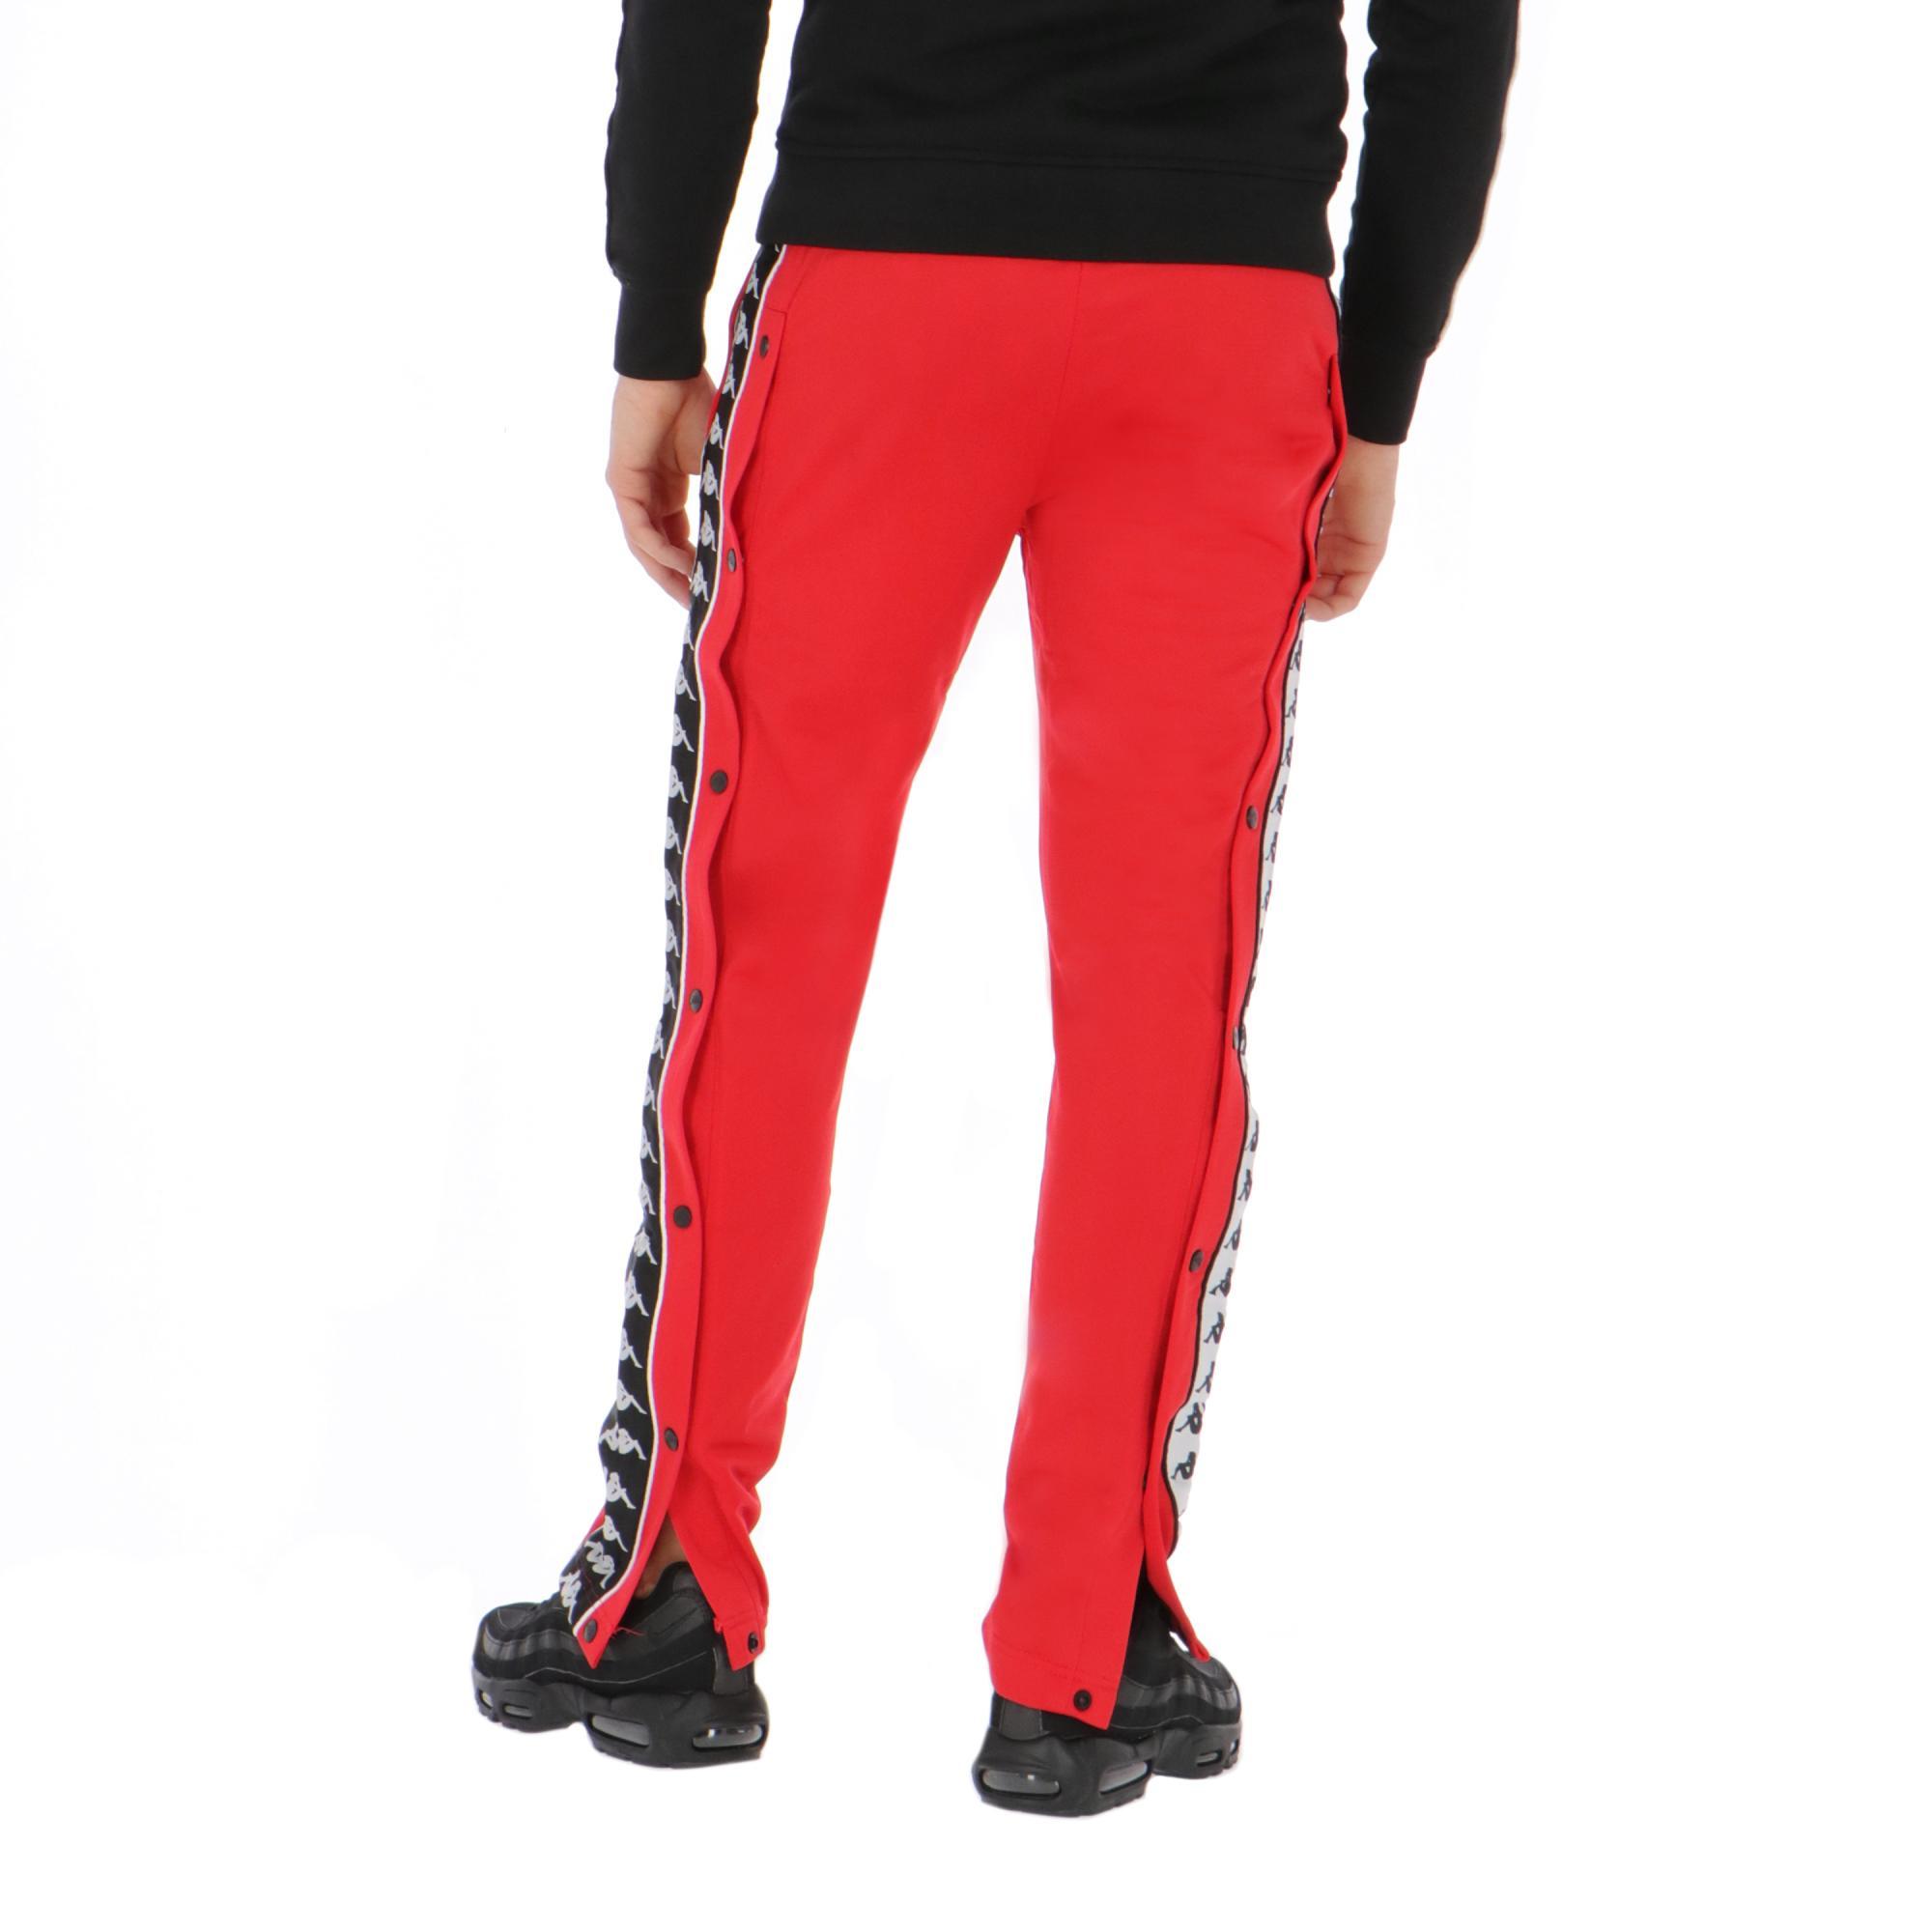 716874b3 Kappa 222 Banda Astoria Snaps Red-black-white | Treesse